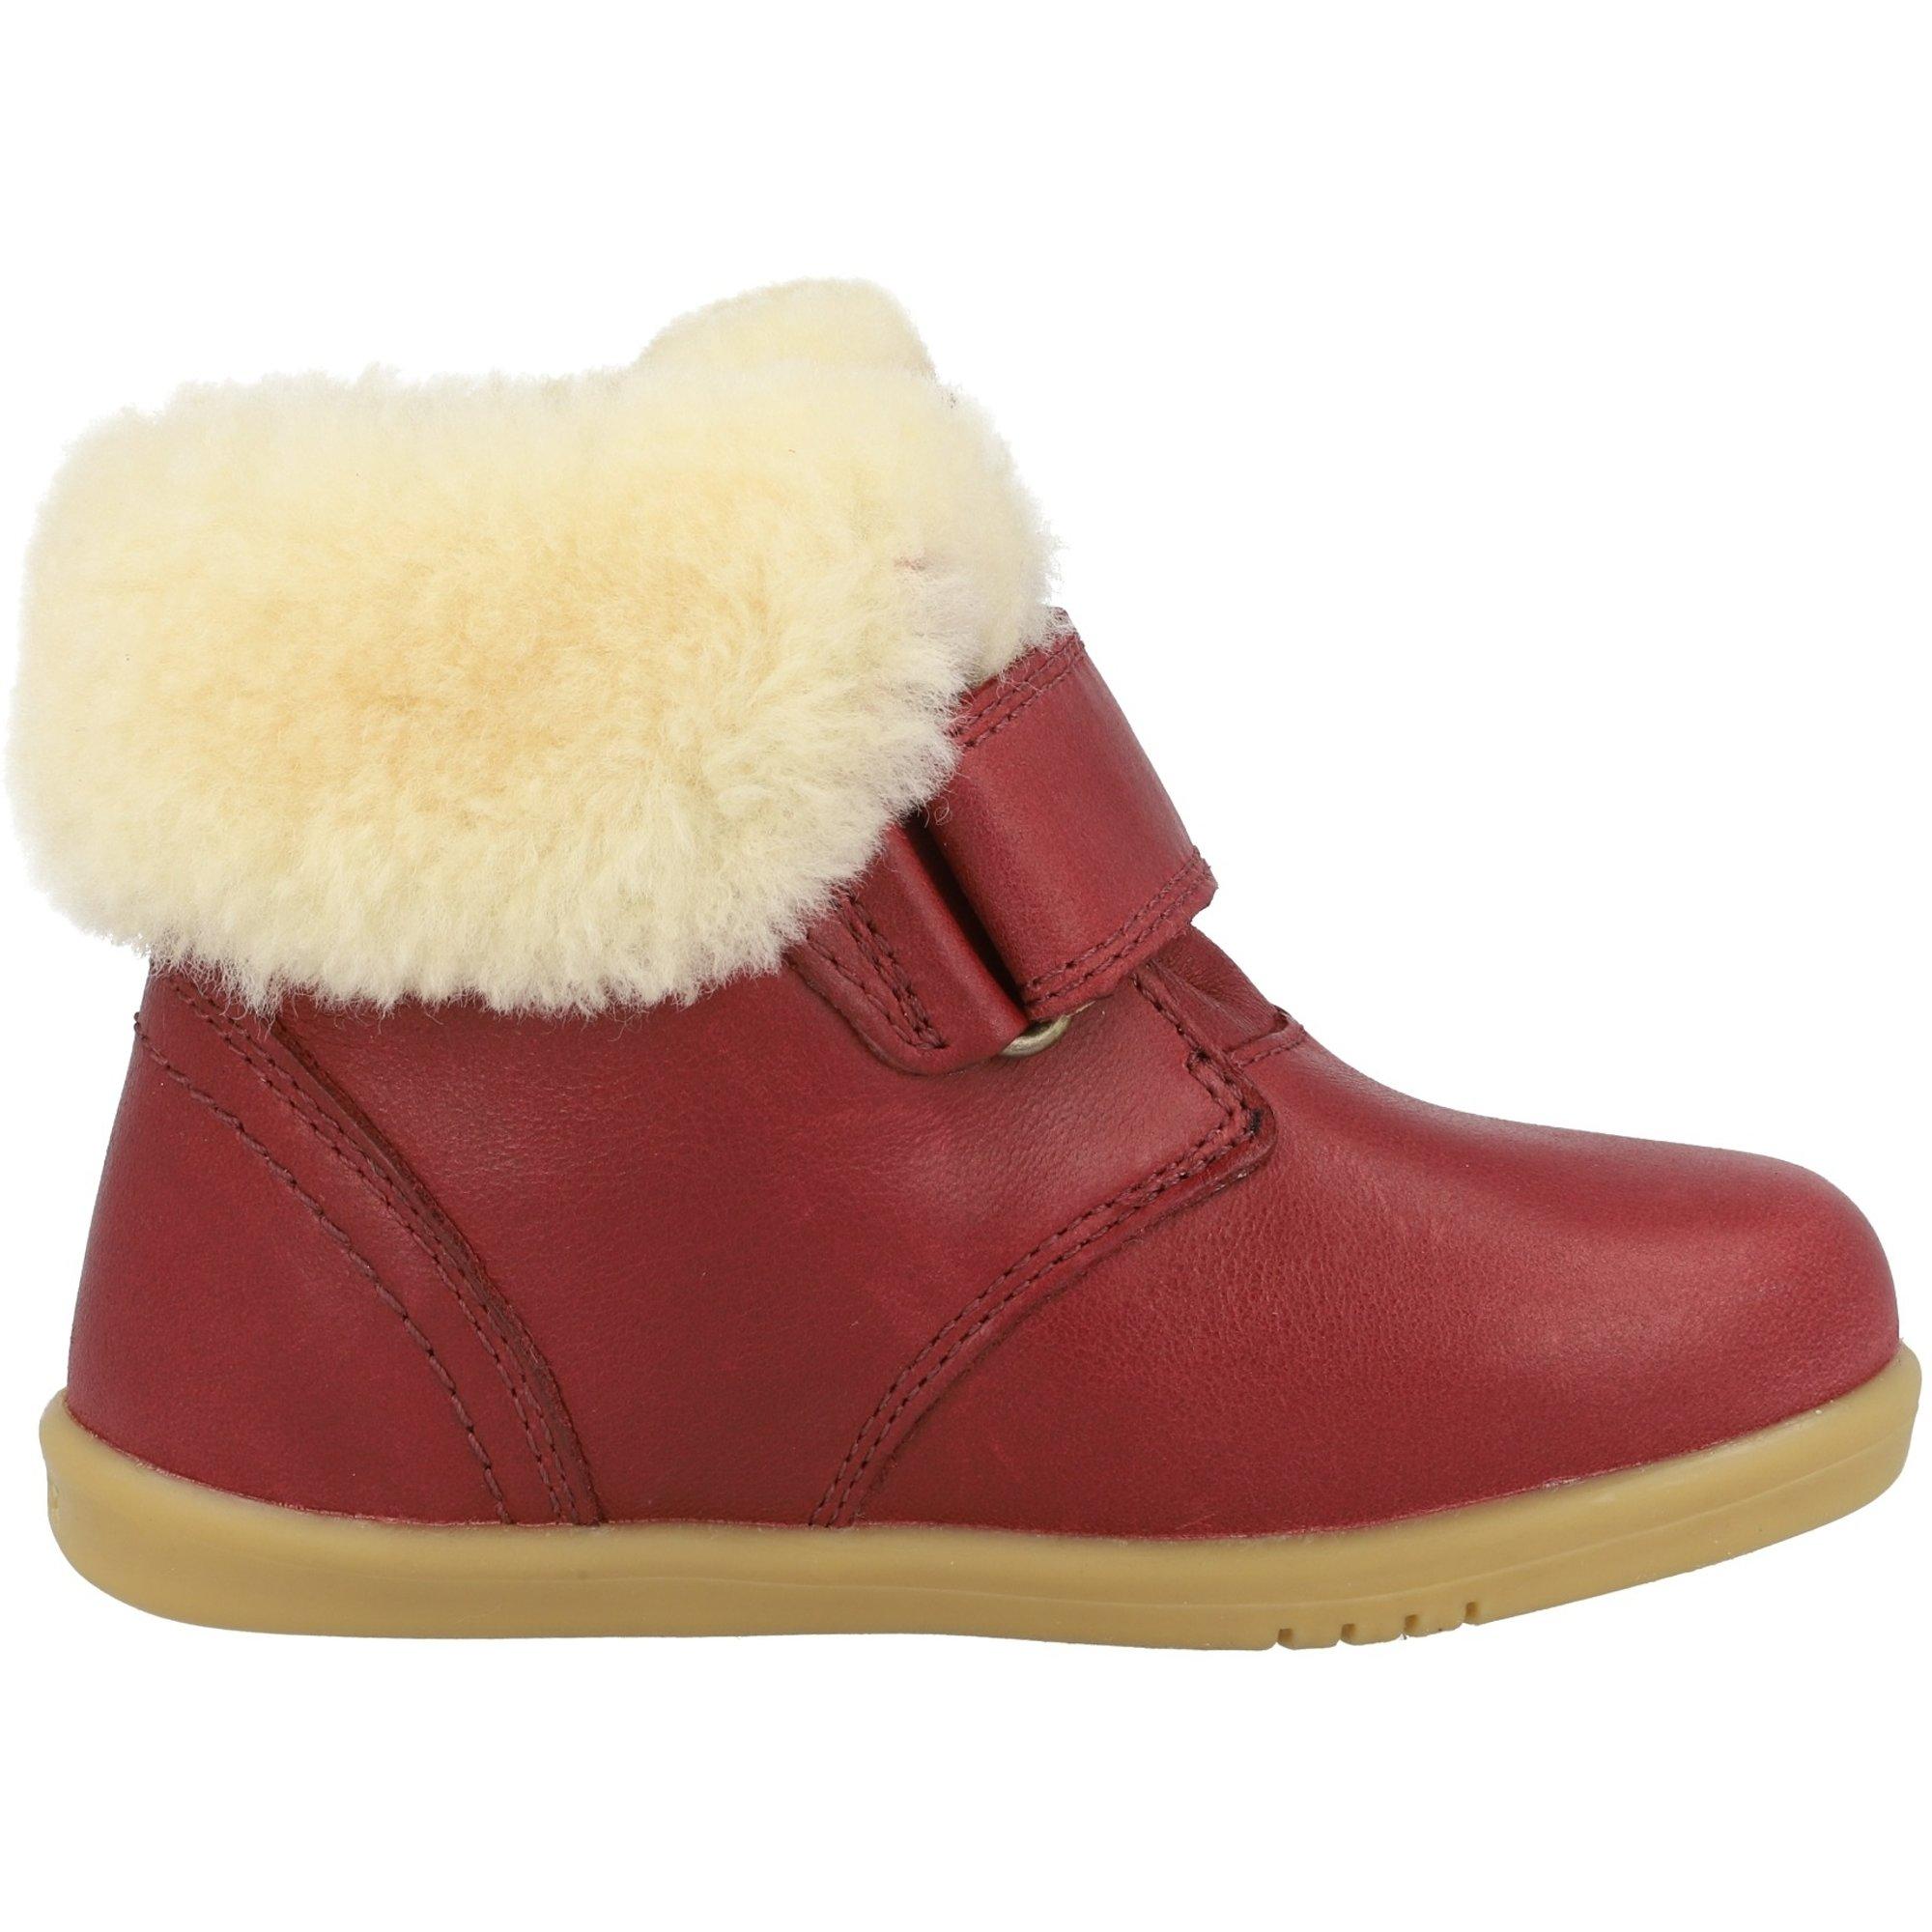 Bobux i-Walk Desert Arctic Sherbet Quickdry Vintage-Look Leather